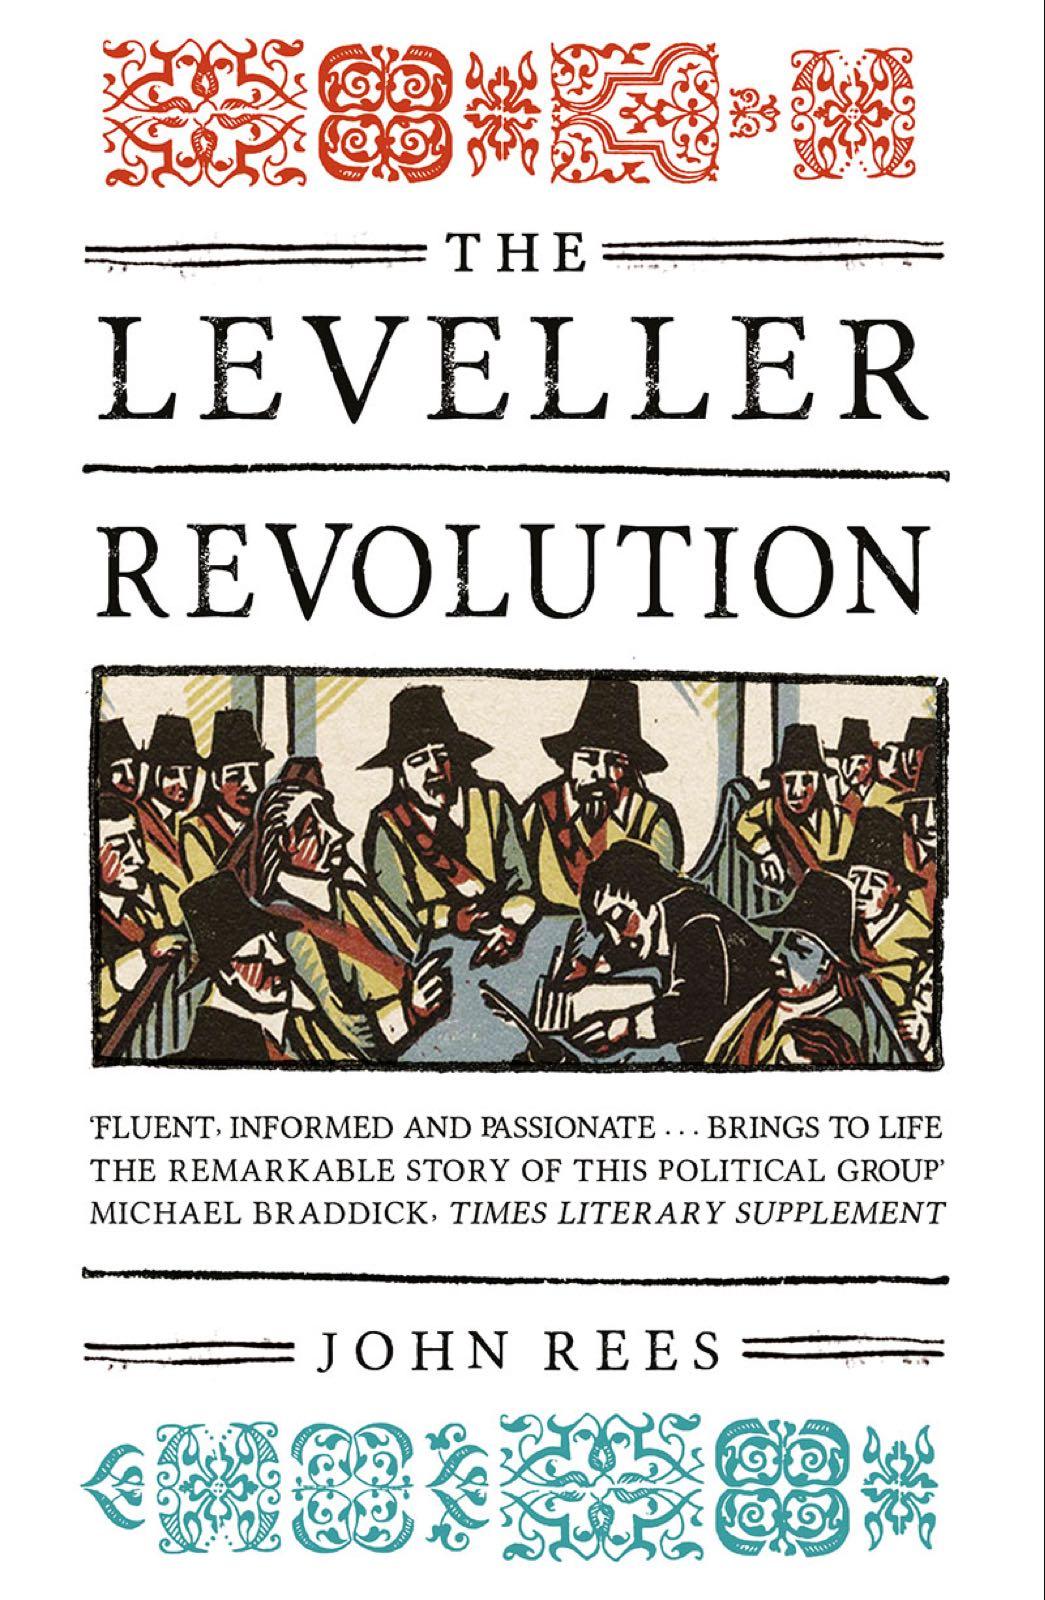 Book: The Leveller Revolution (SKU: BK-FA-033)